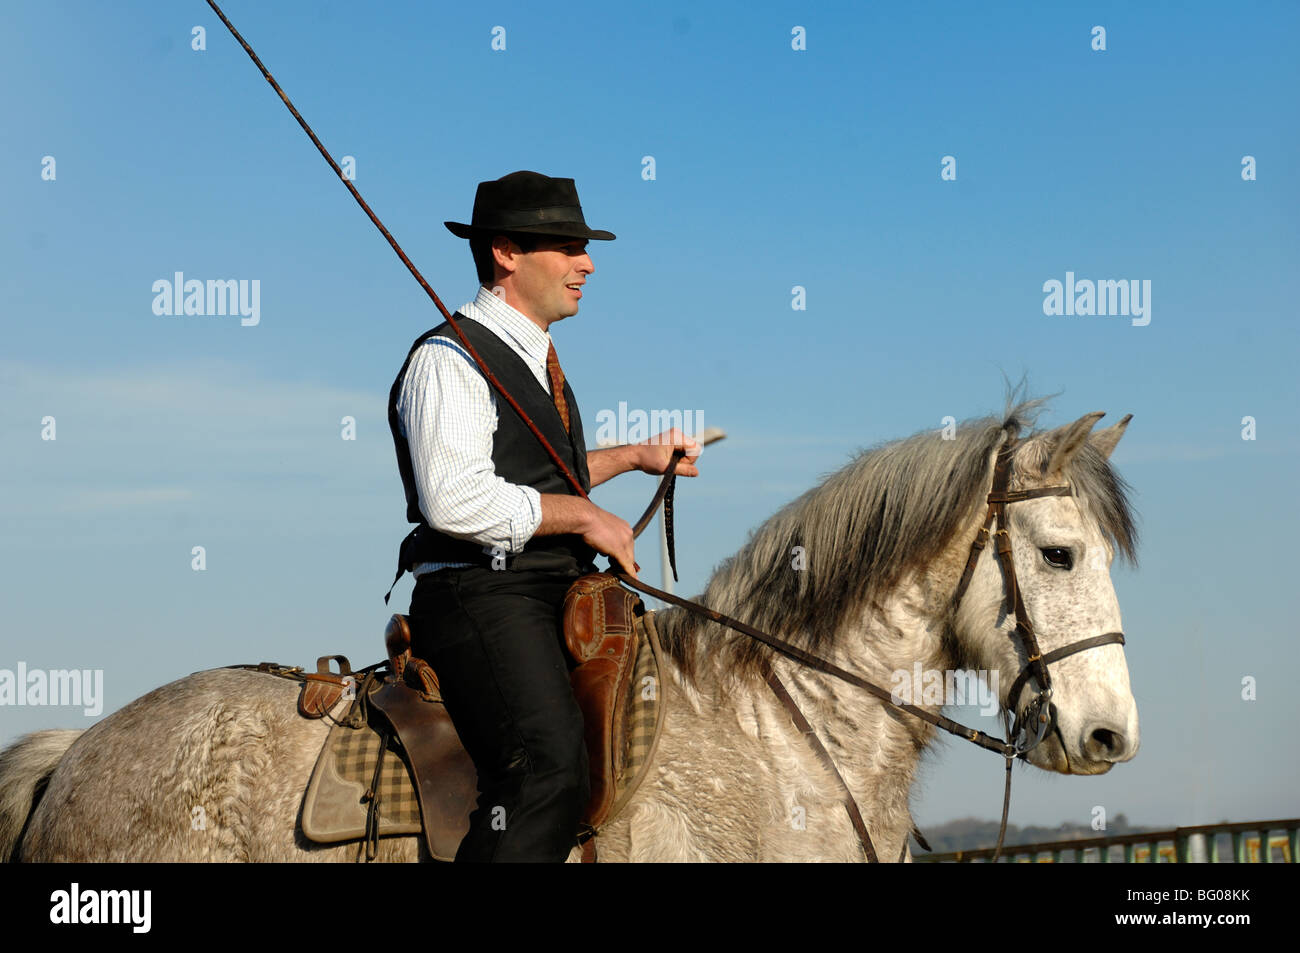 Cheval Camargue Rider connu comme un